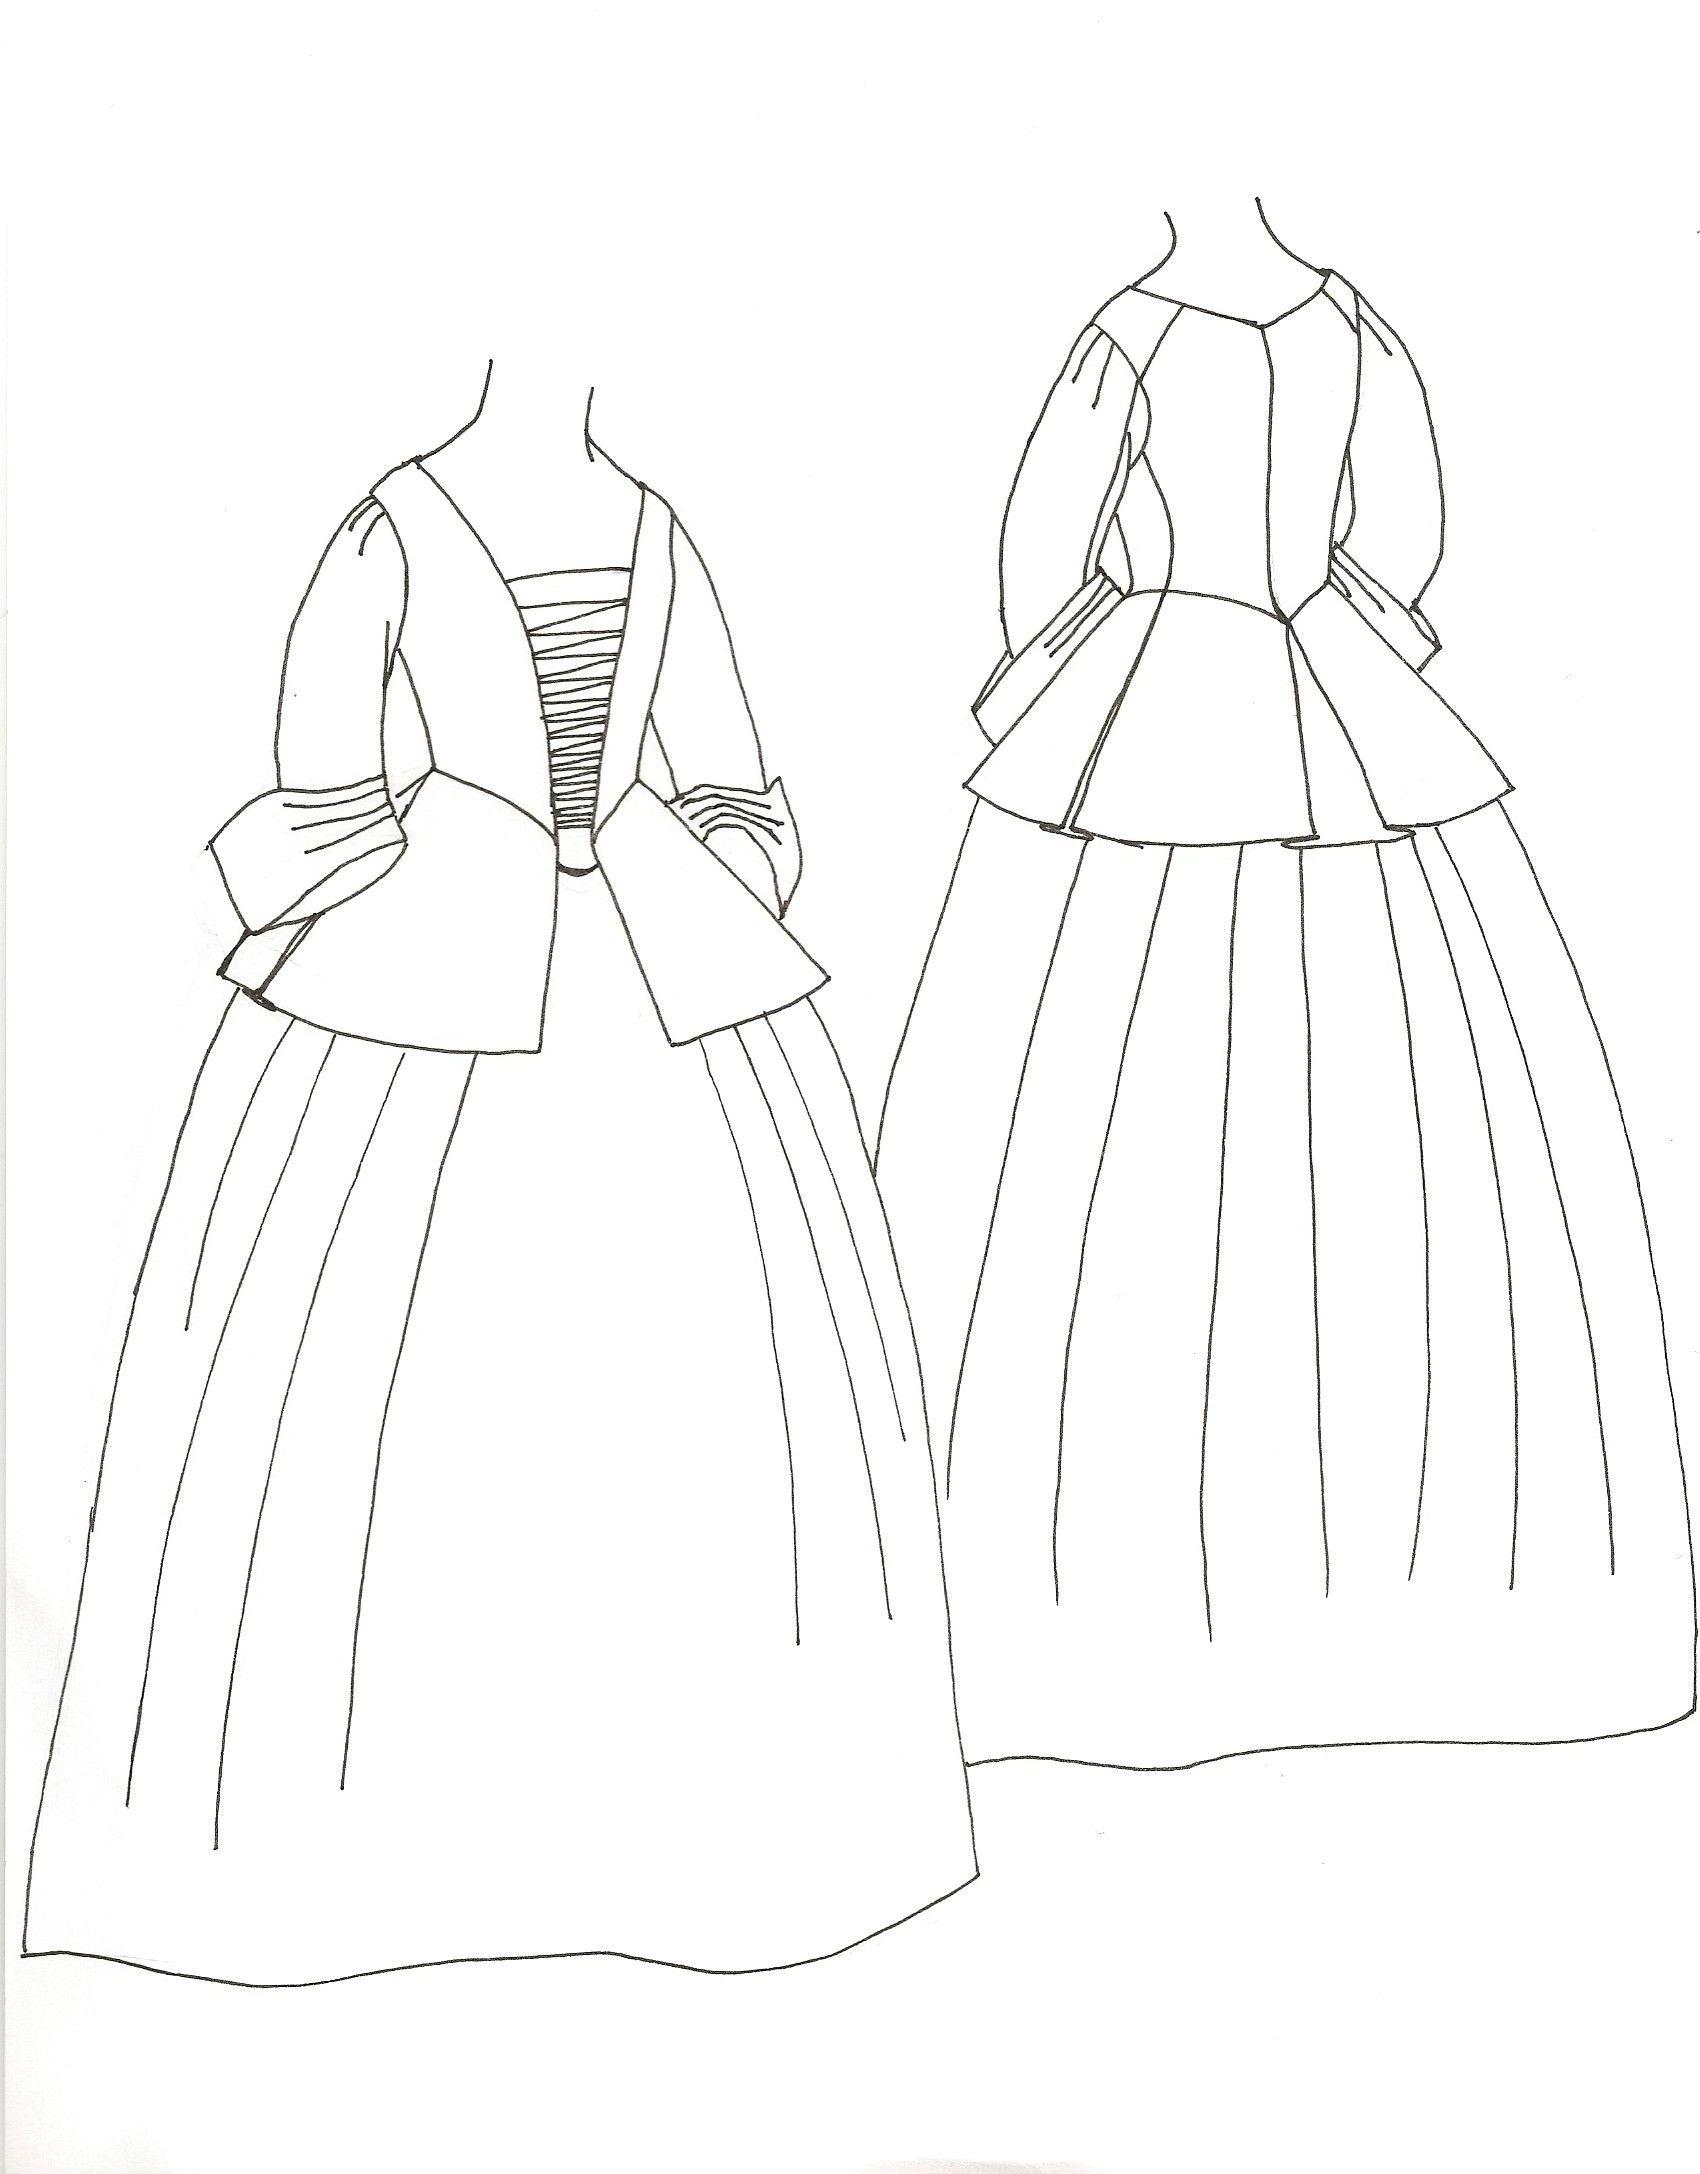 calico jacket and petticoat 18th century the jacket jackets 1968 Fashion Clothing outline sketch of jacket petticoat